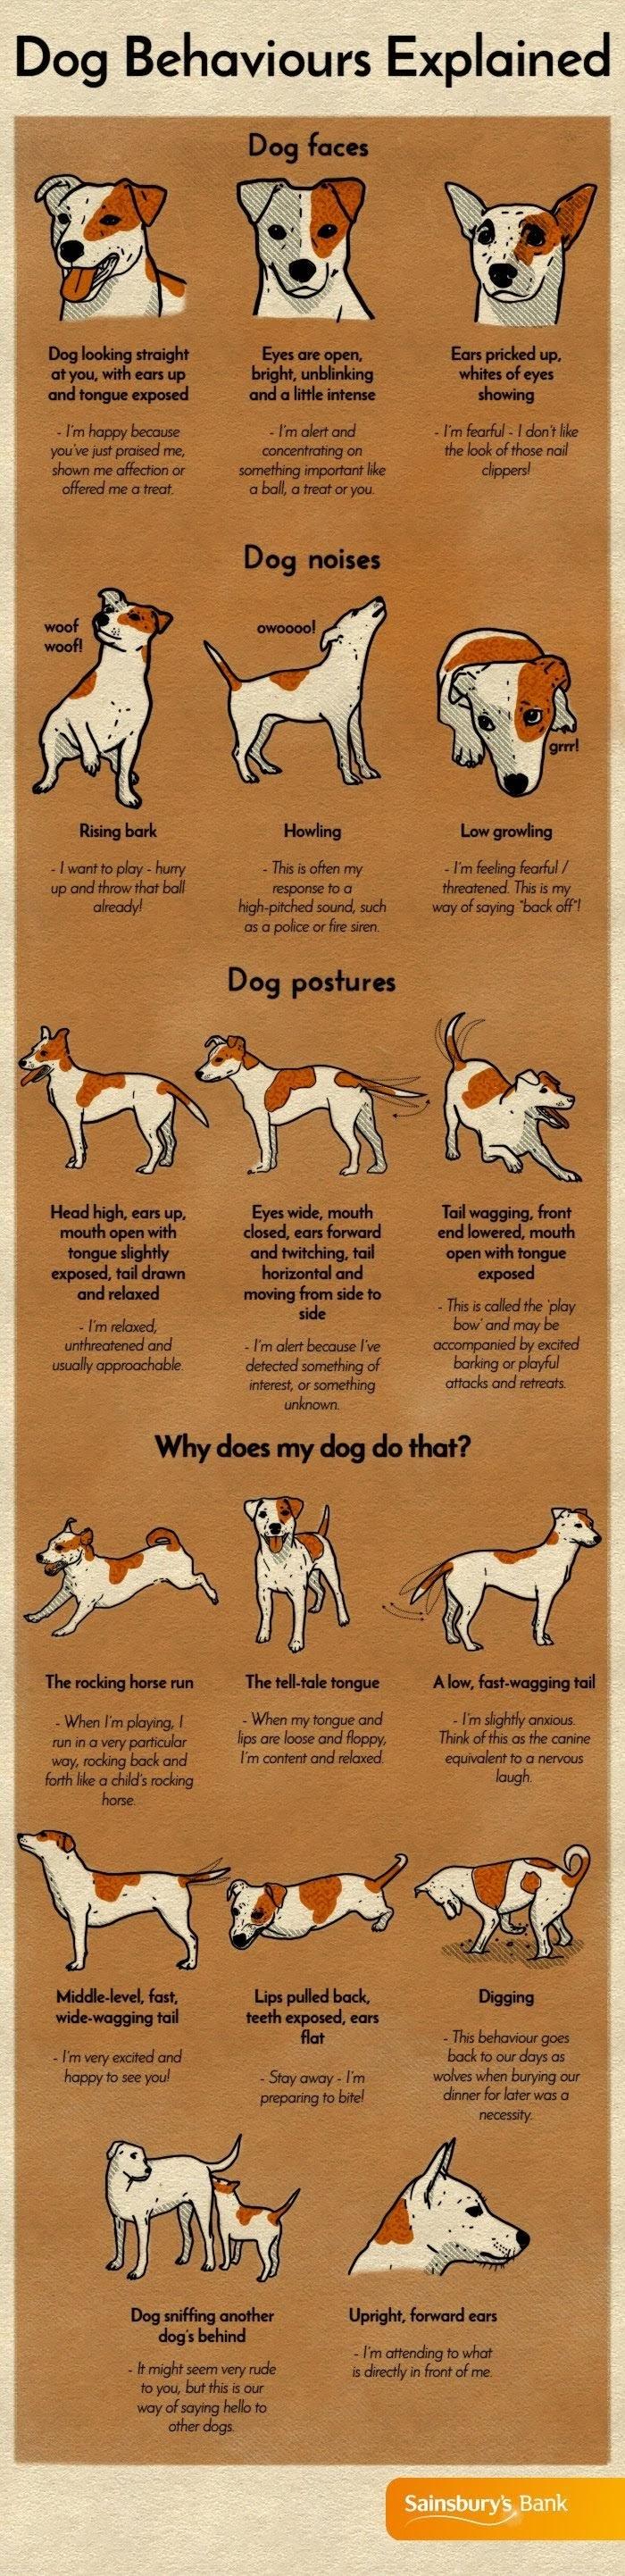 Dog behaviours explained #infographic